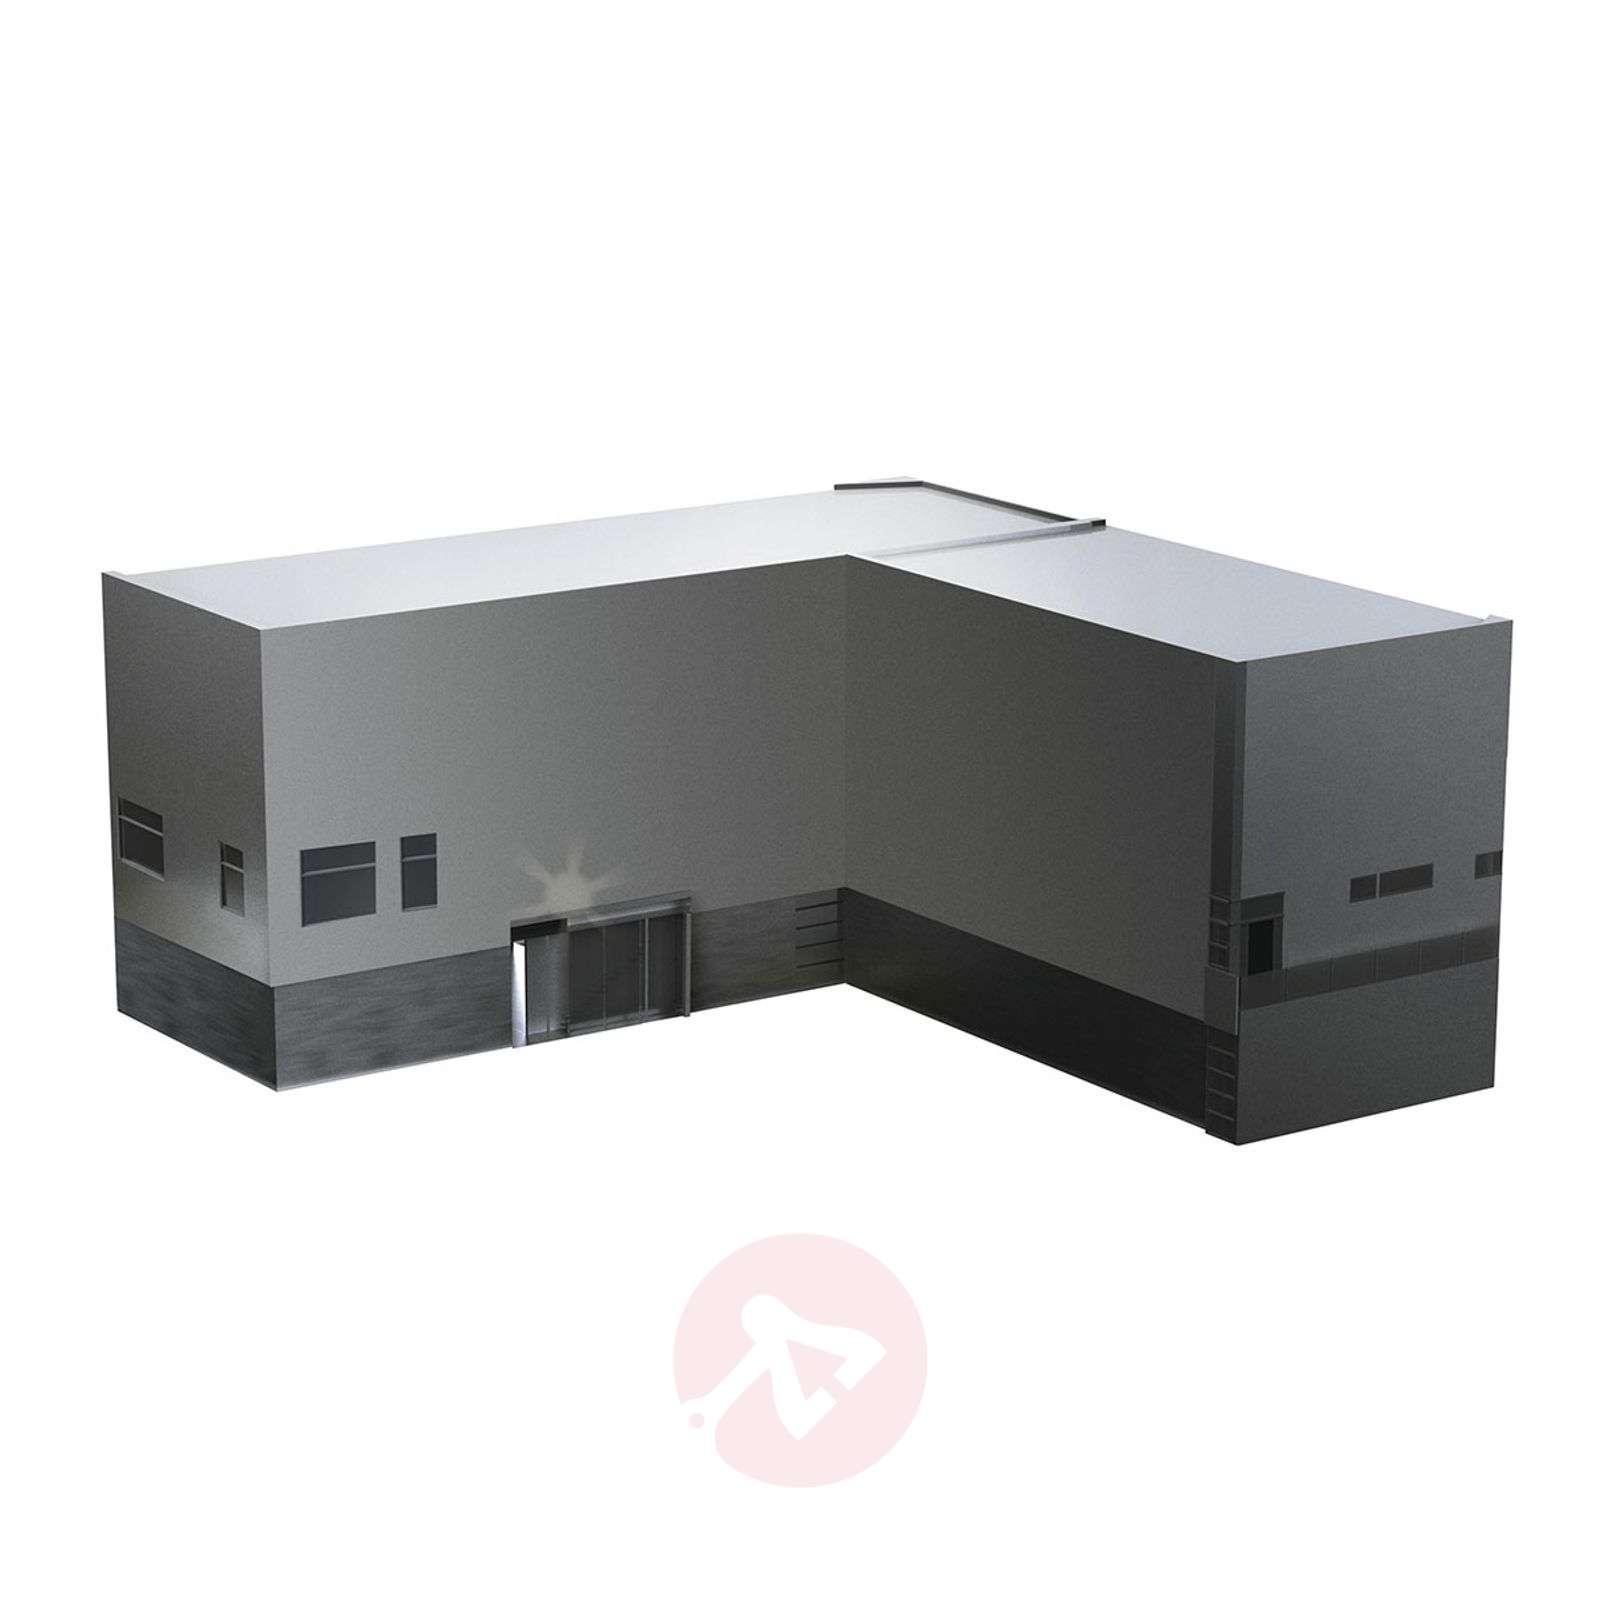 STEINEL XLED Pro Square SL XL kohdevalaisin ulos-8506076-01